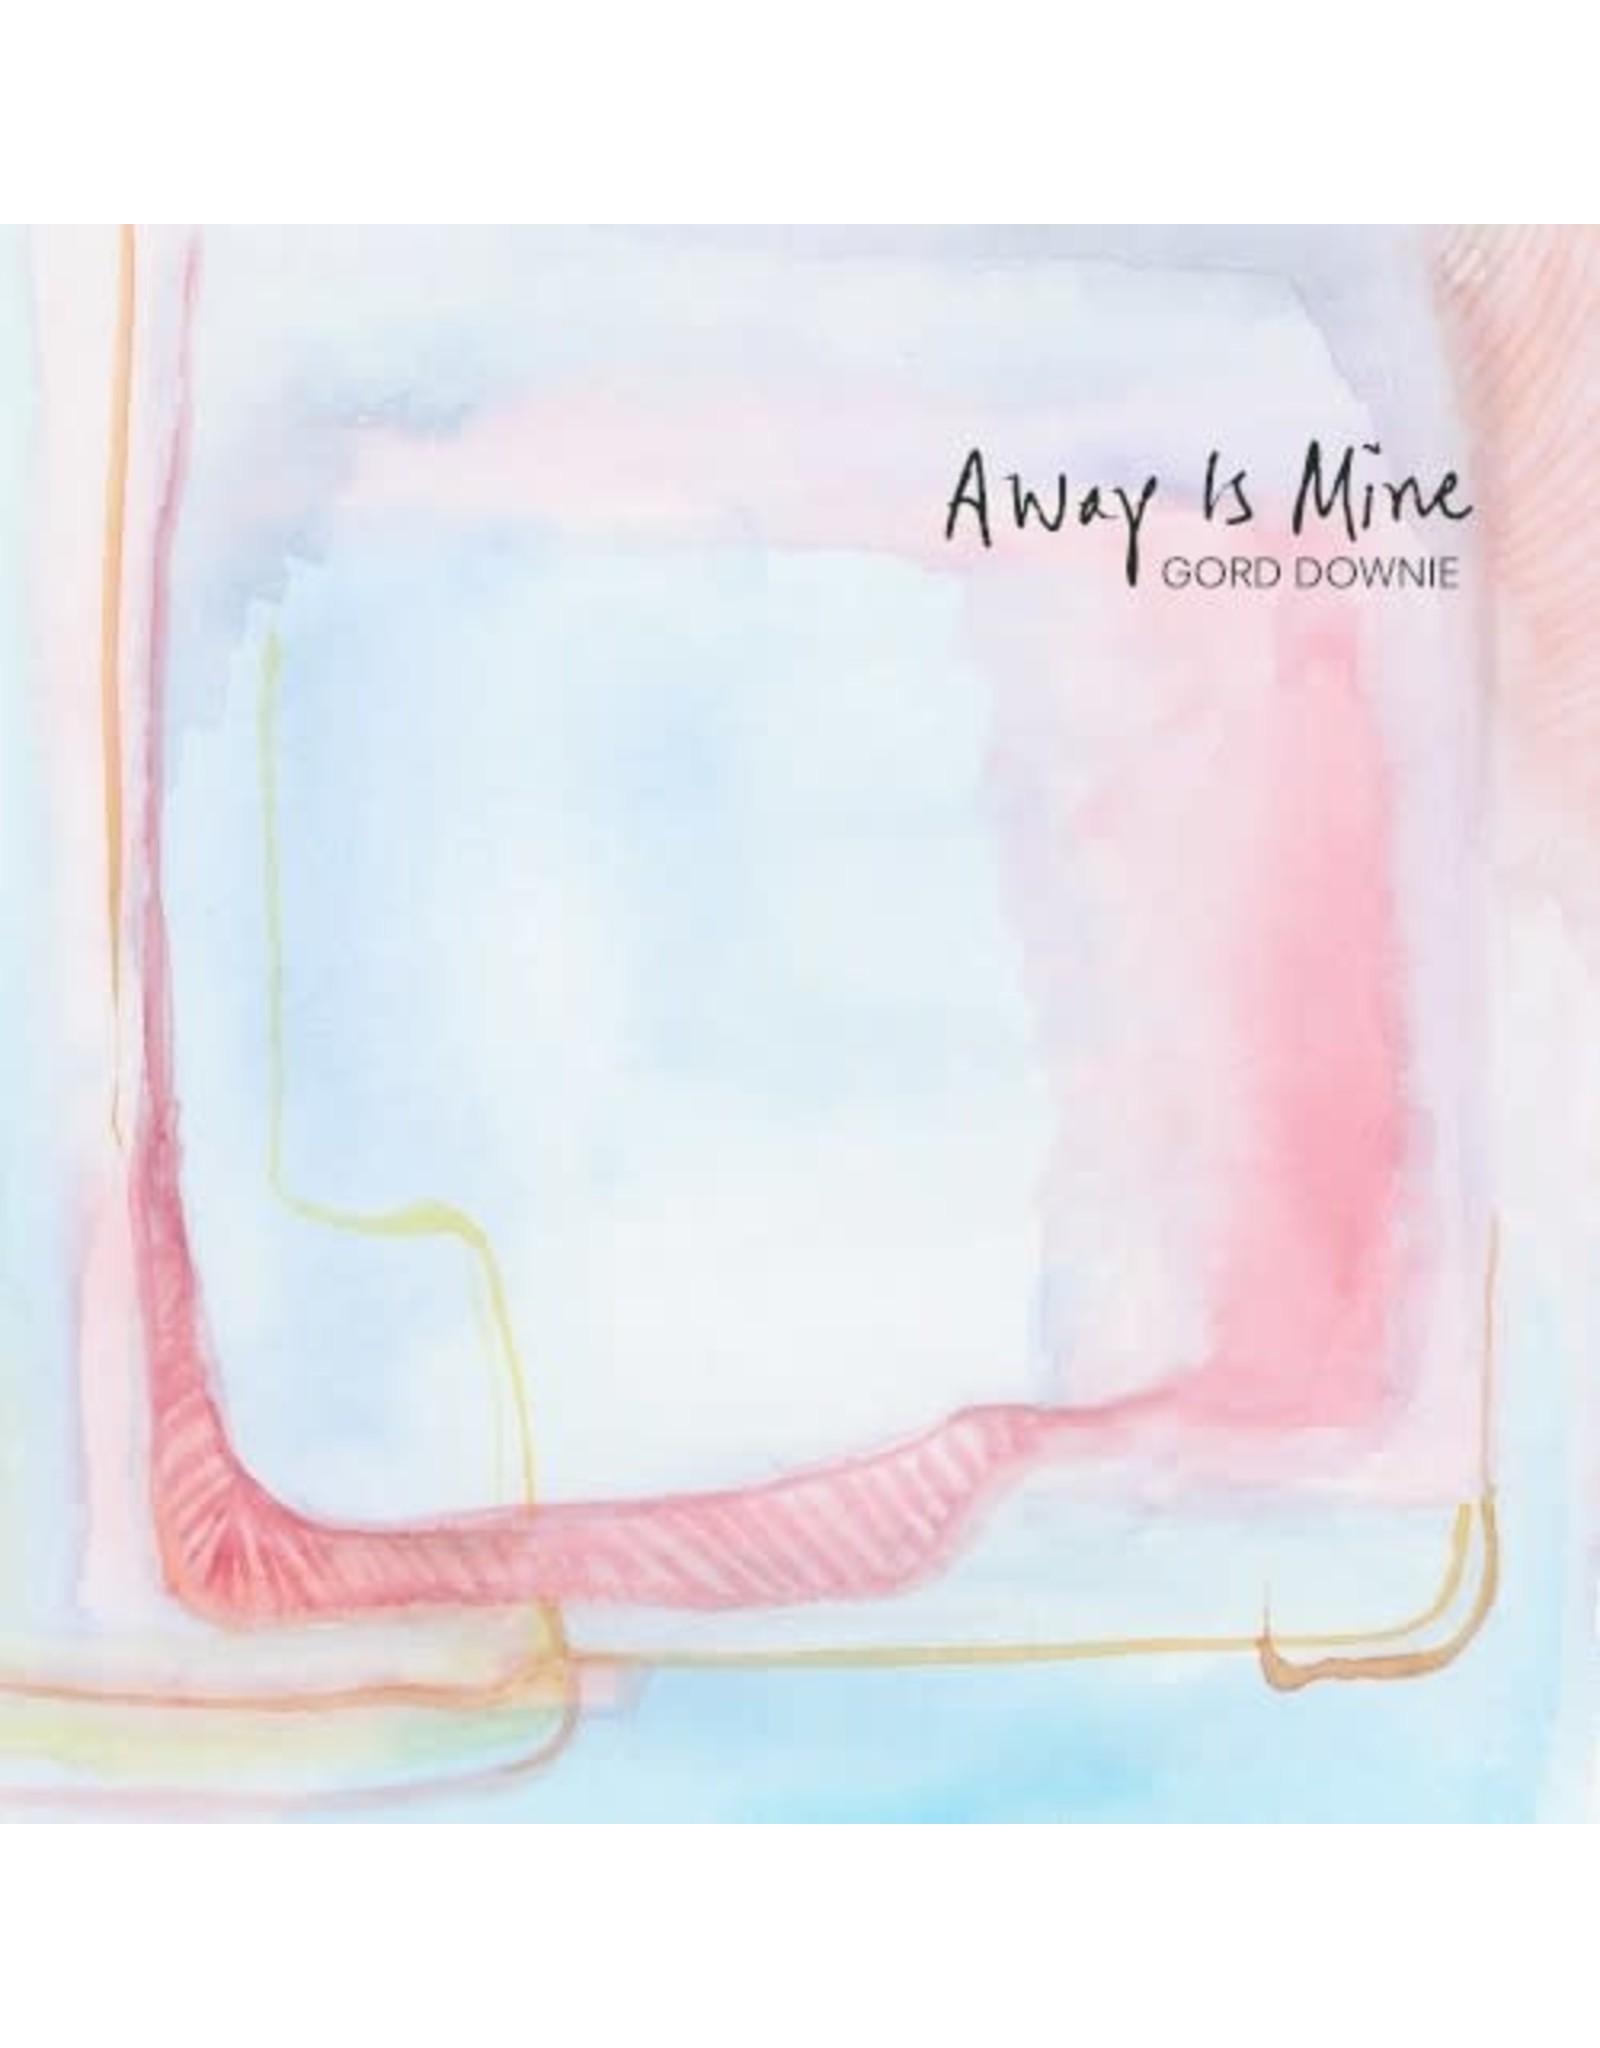 Downie, Gord - All Is Mine (2 CD)